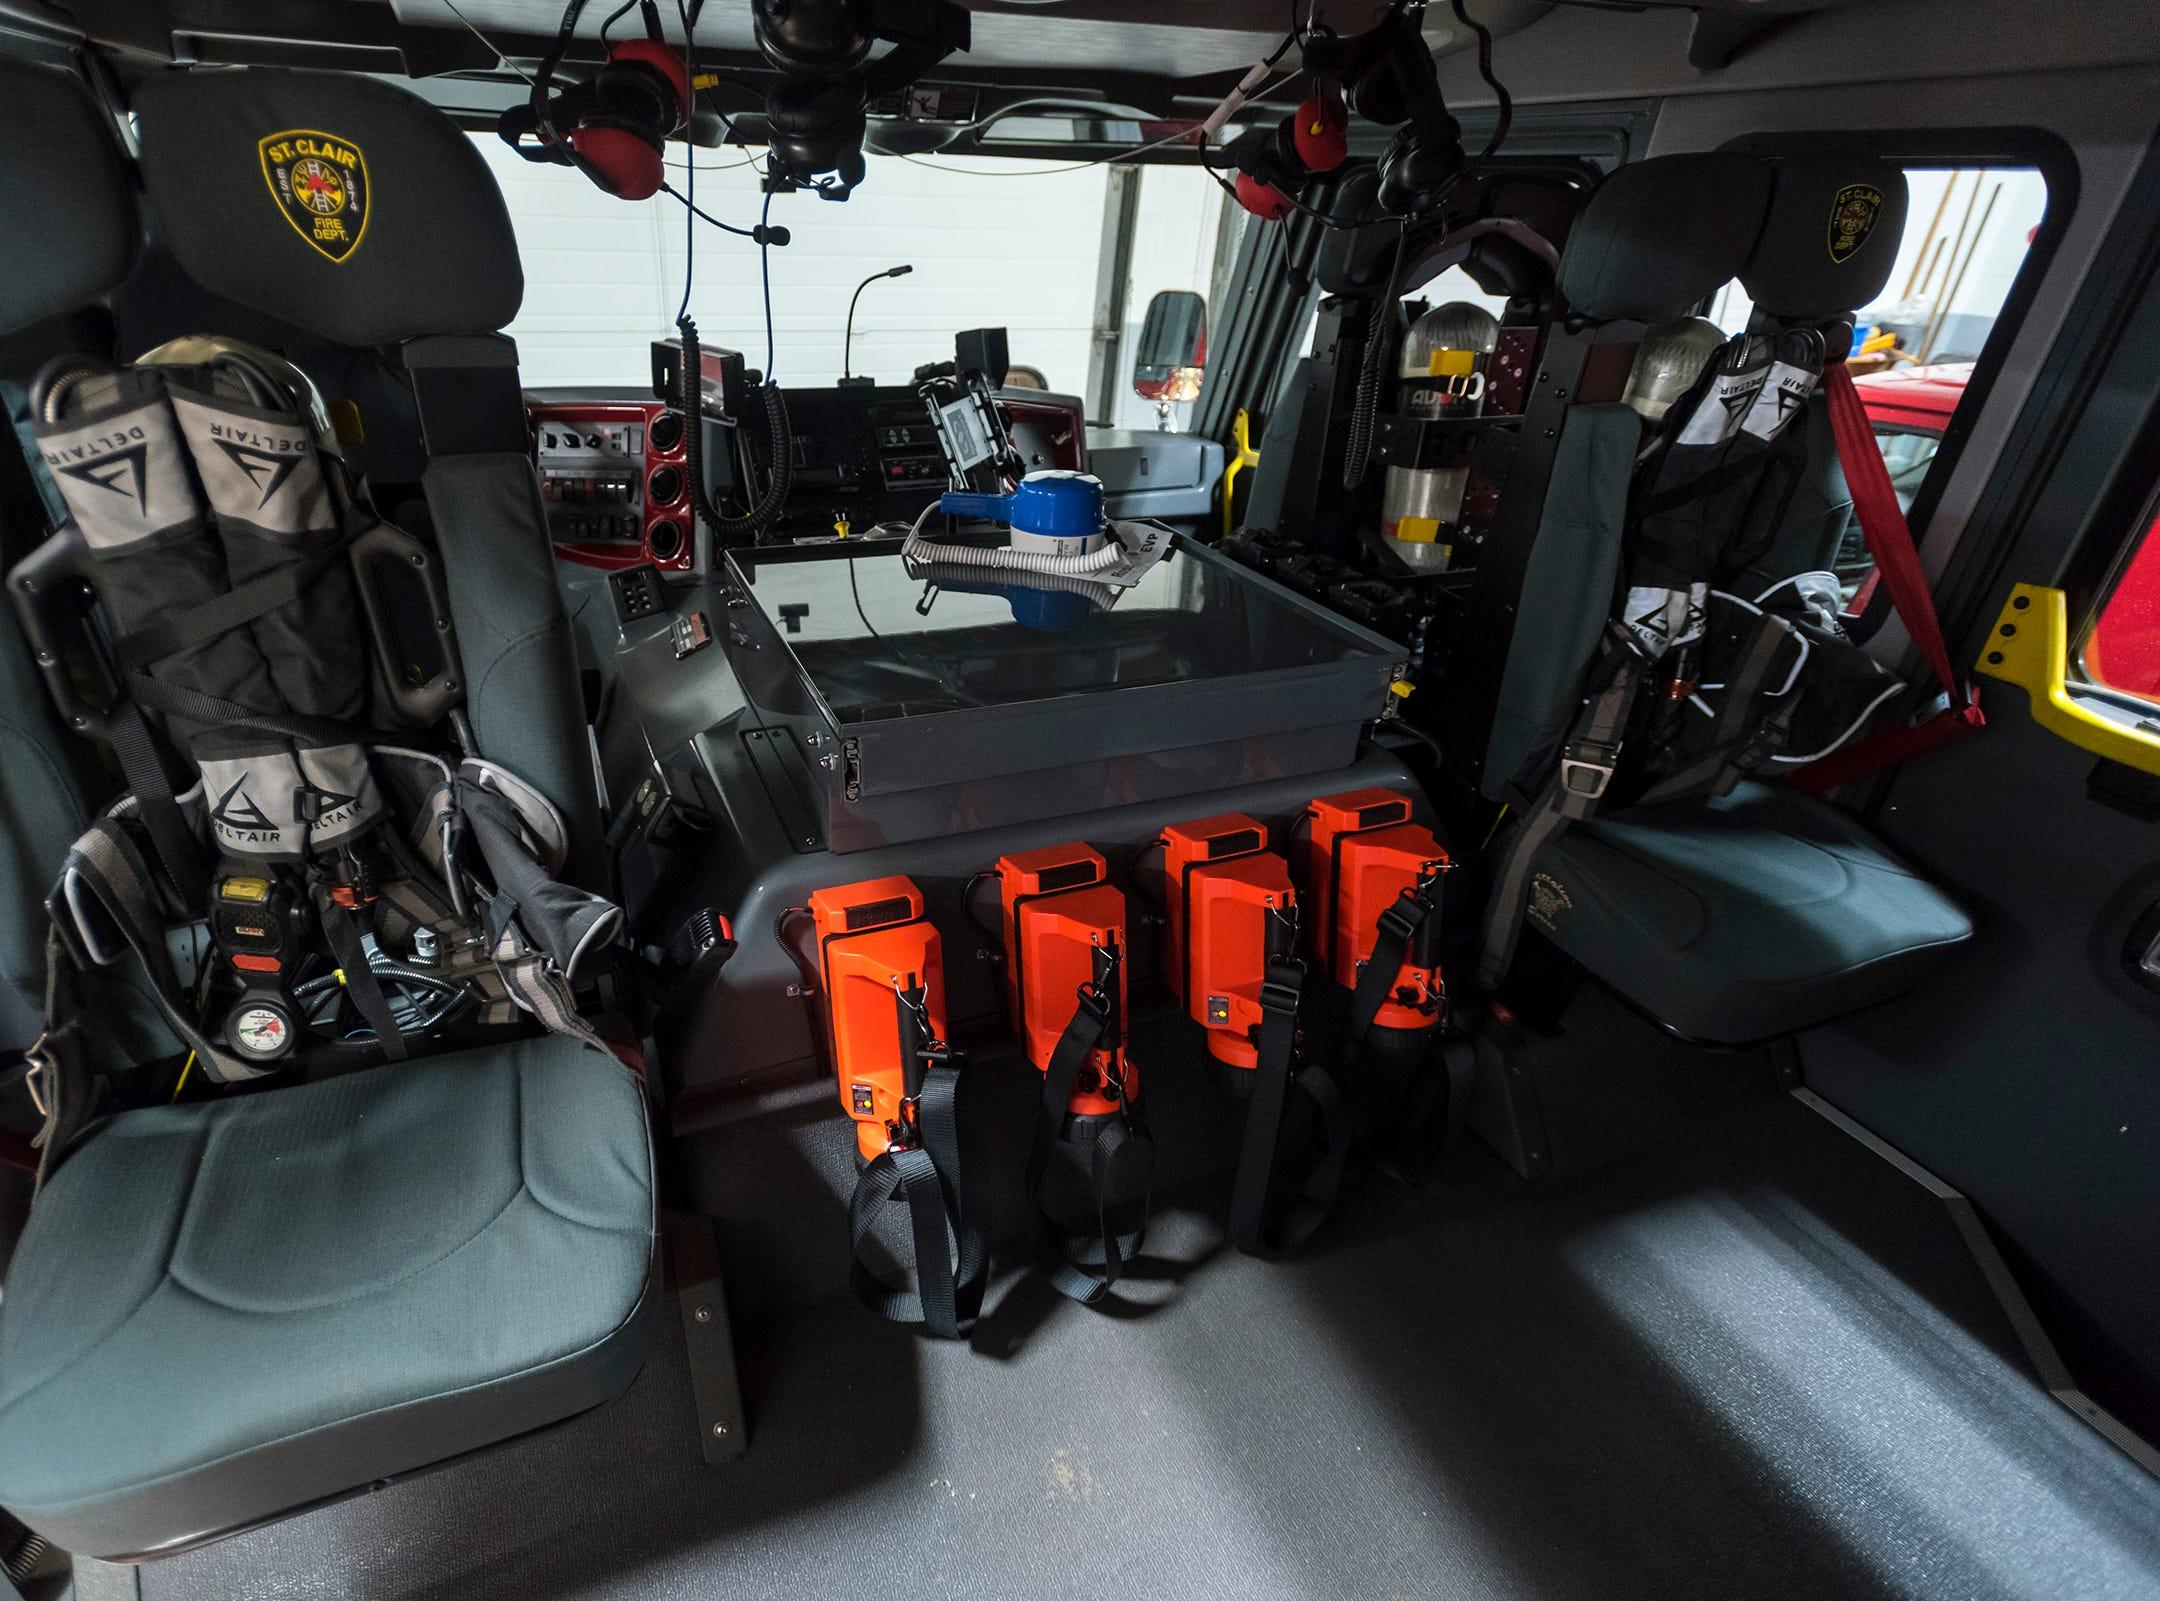 The interior cabin of St. Clair Fire Department's new Rosenbauer pumper truck.